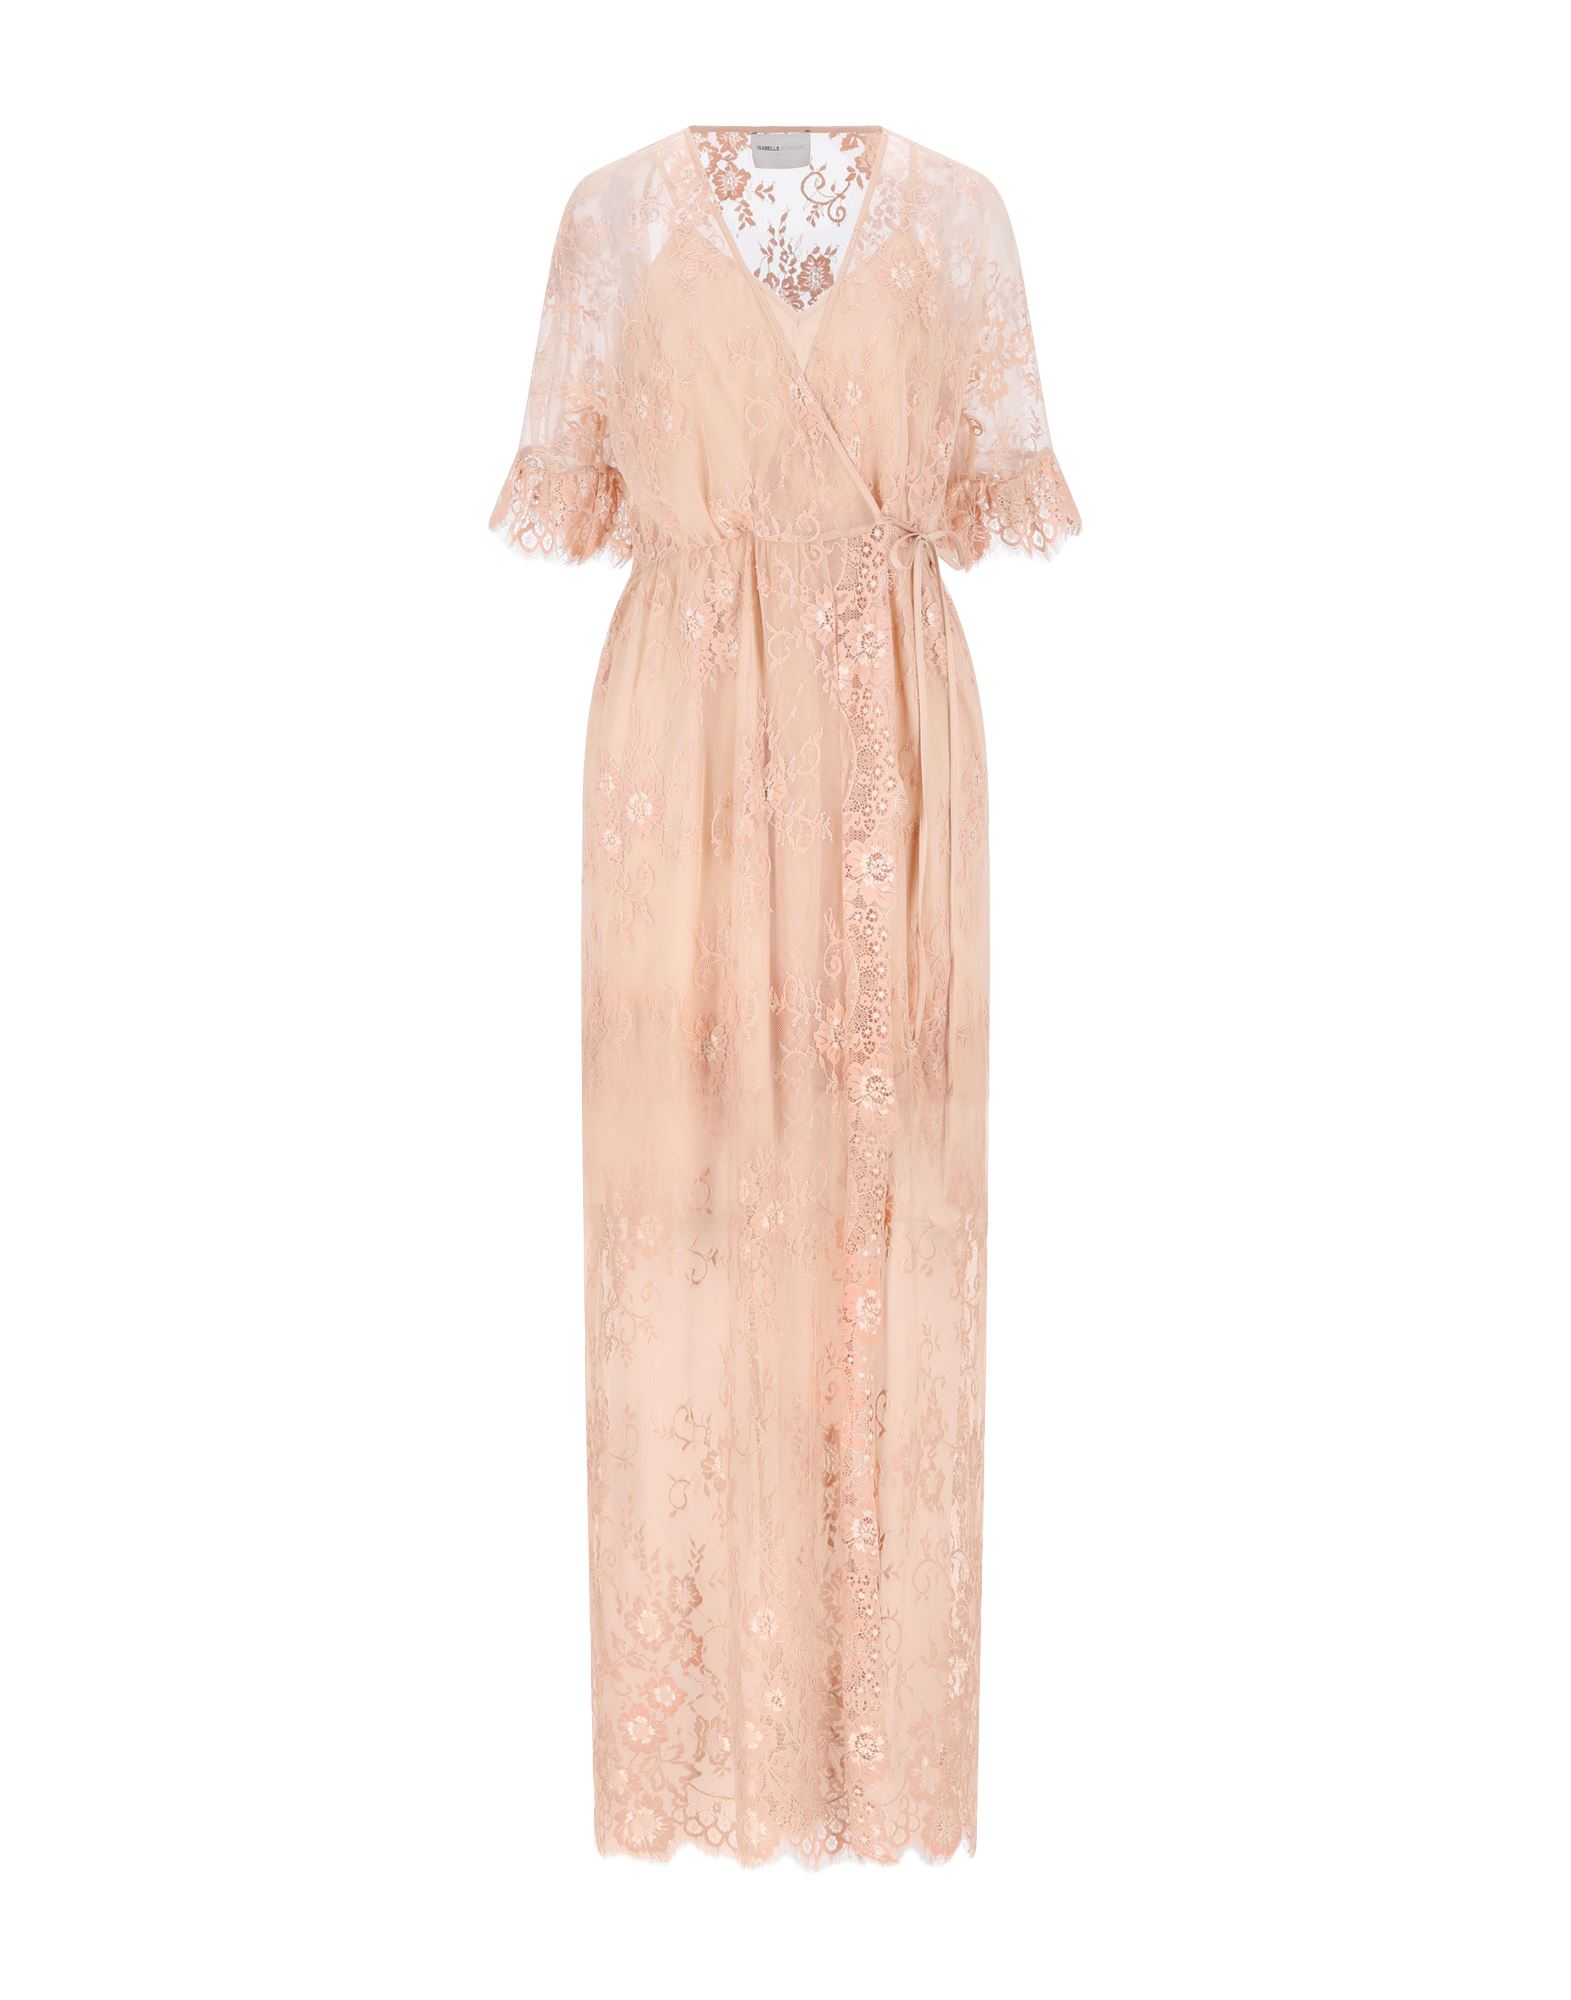 Фото - ISABELLE BLANCHE Paris Длинное платье isabelle blanche paris платье миди